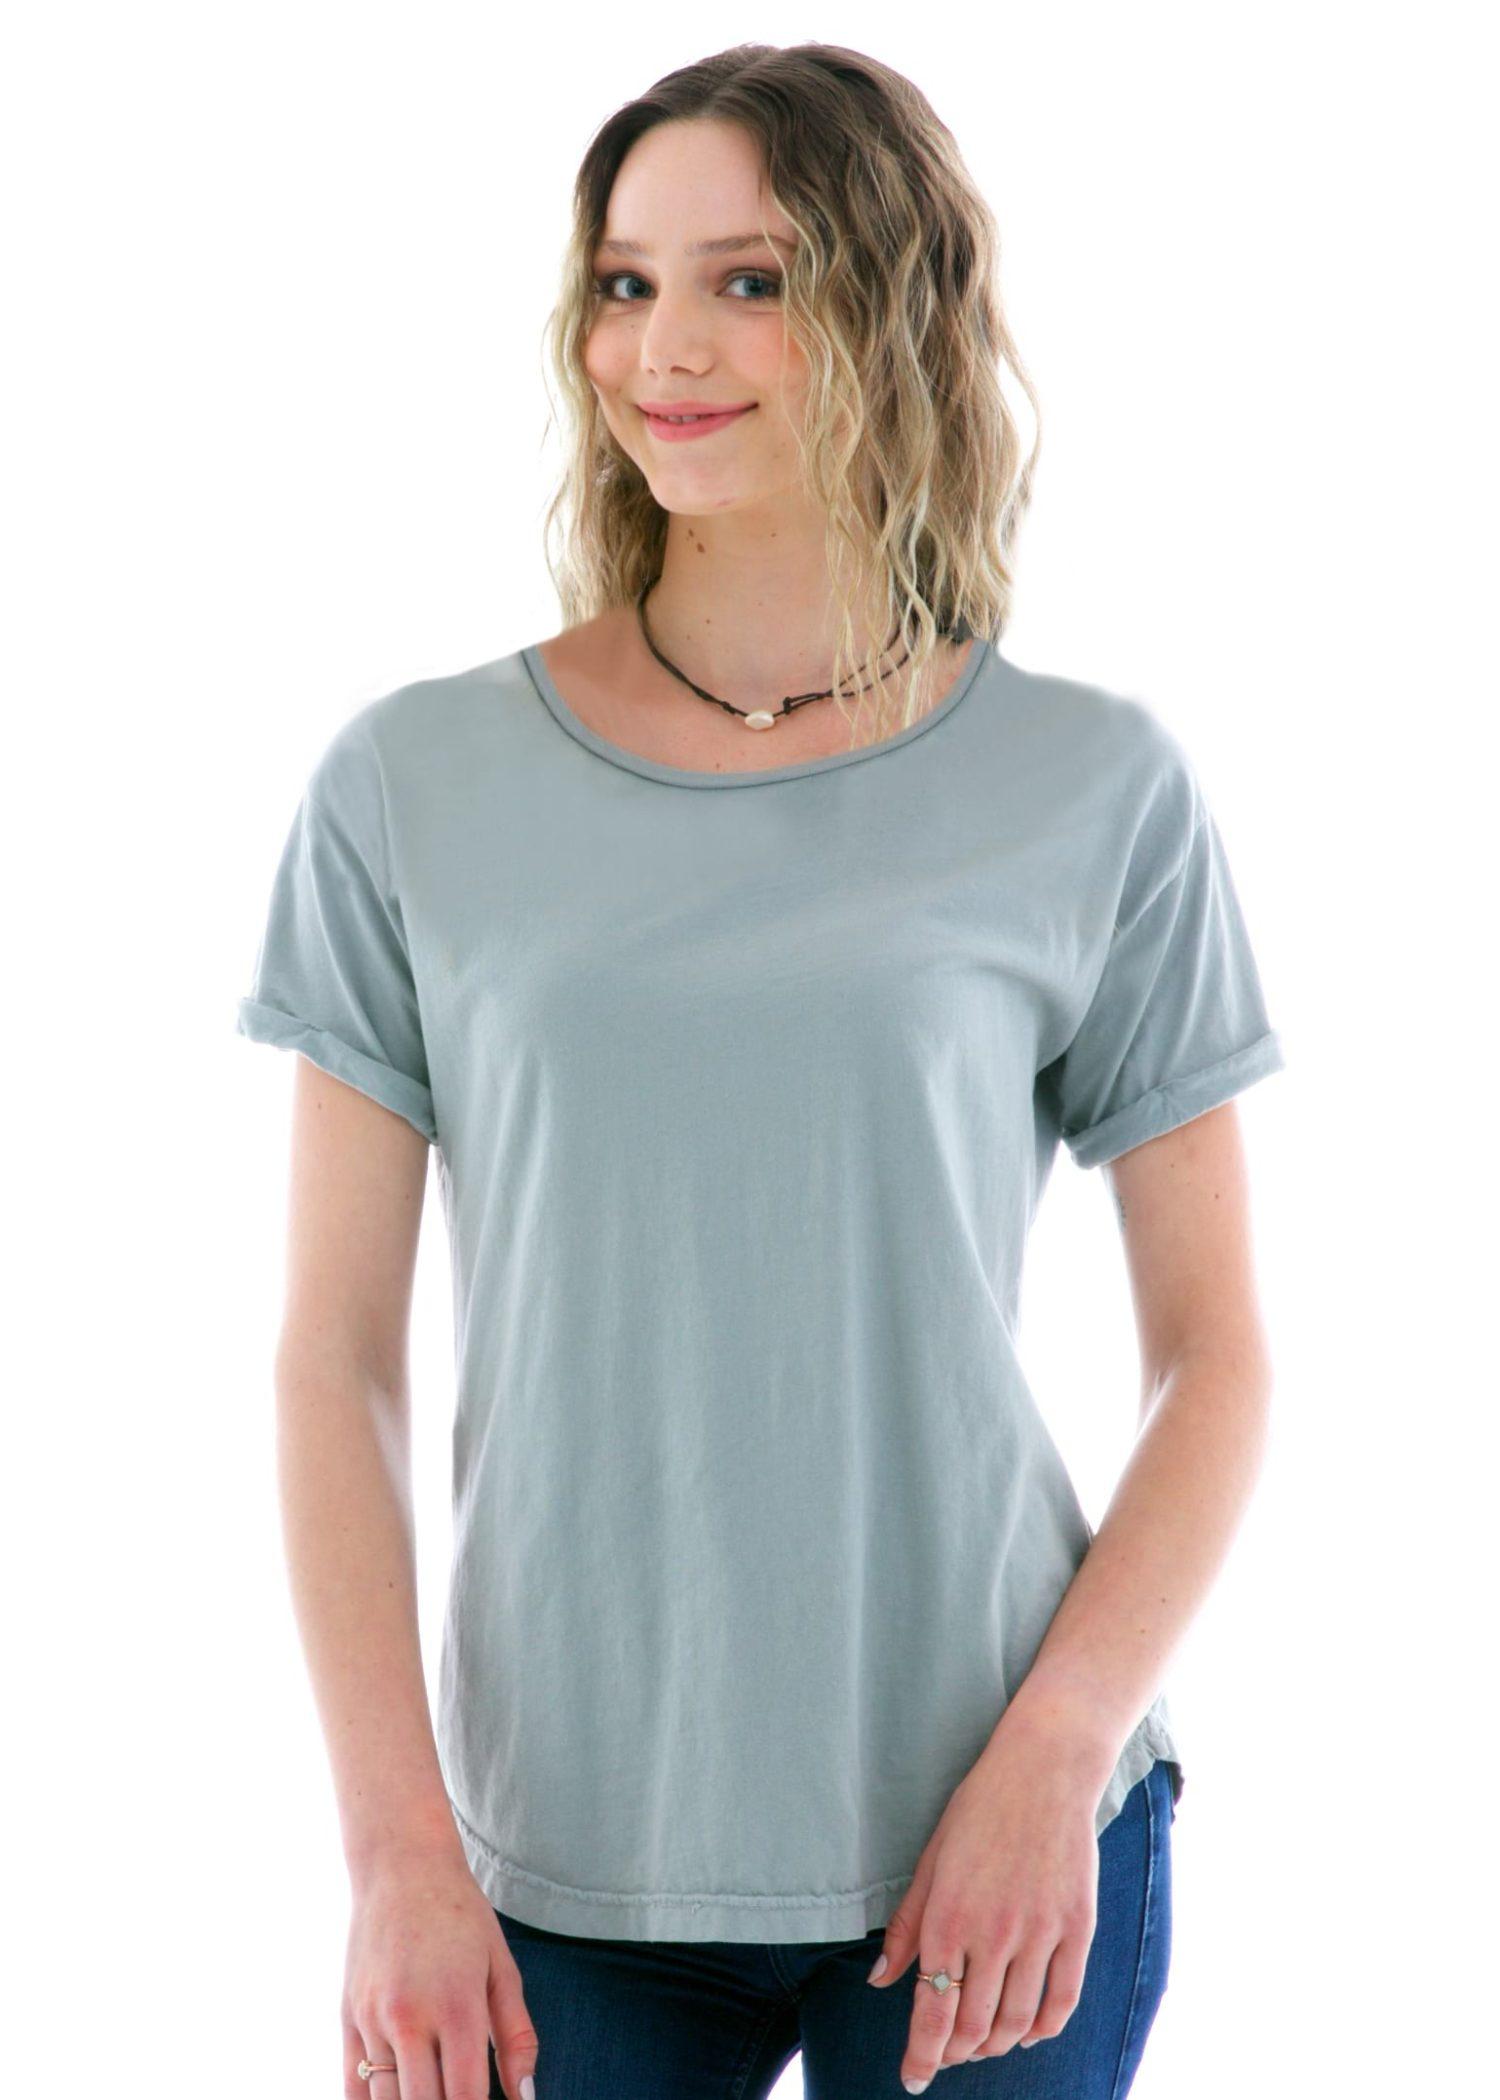 Boyfriend Rollup Crew Short Sleeve T-Shirt Front View